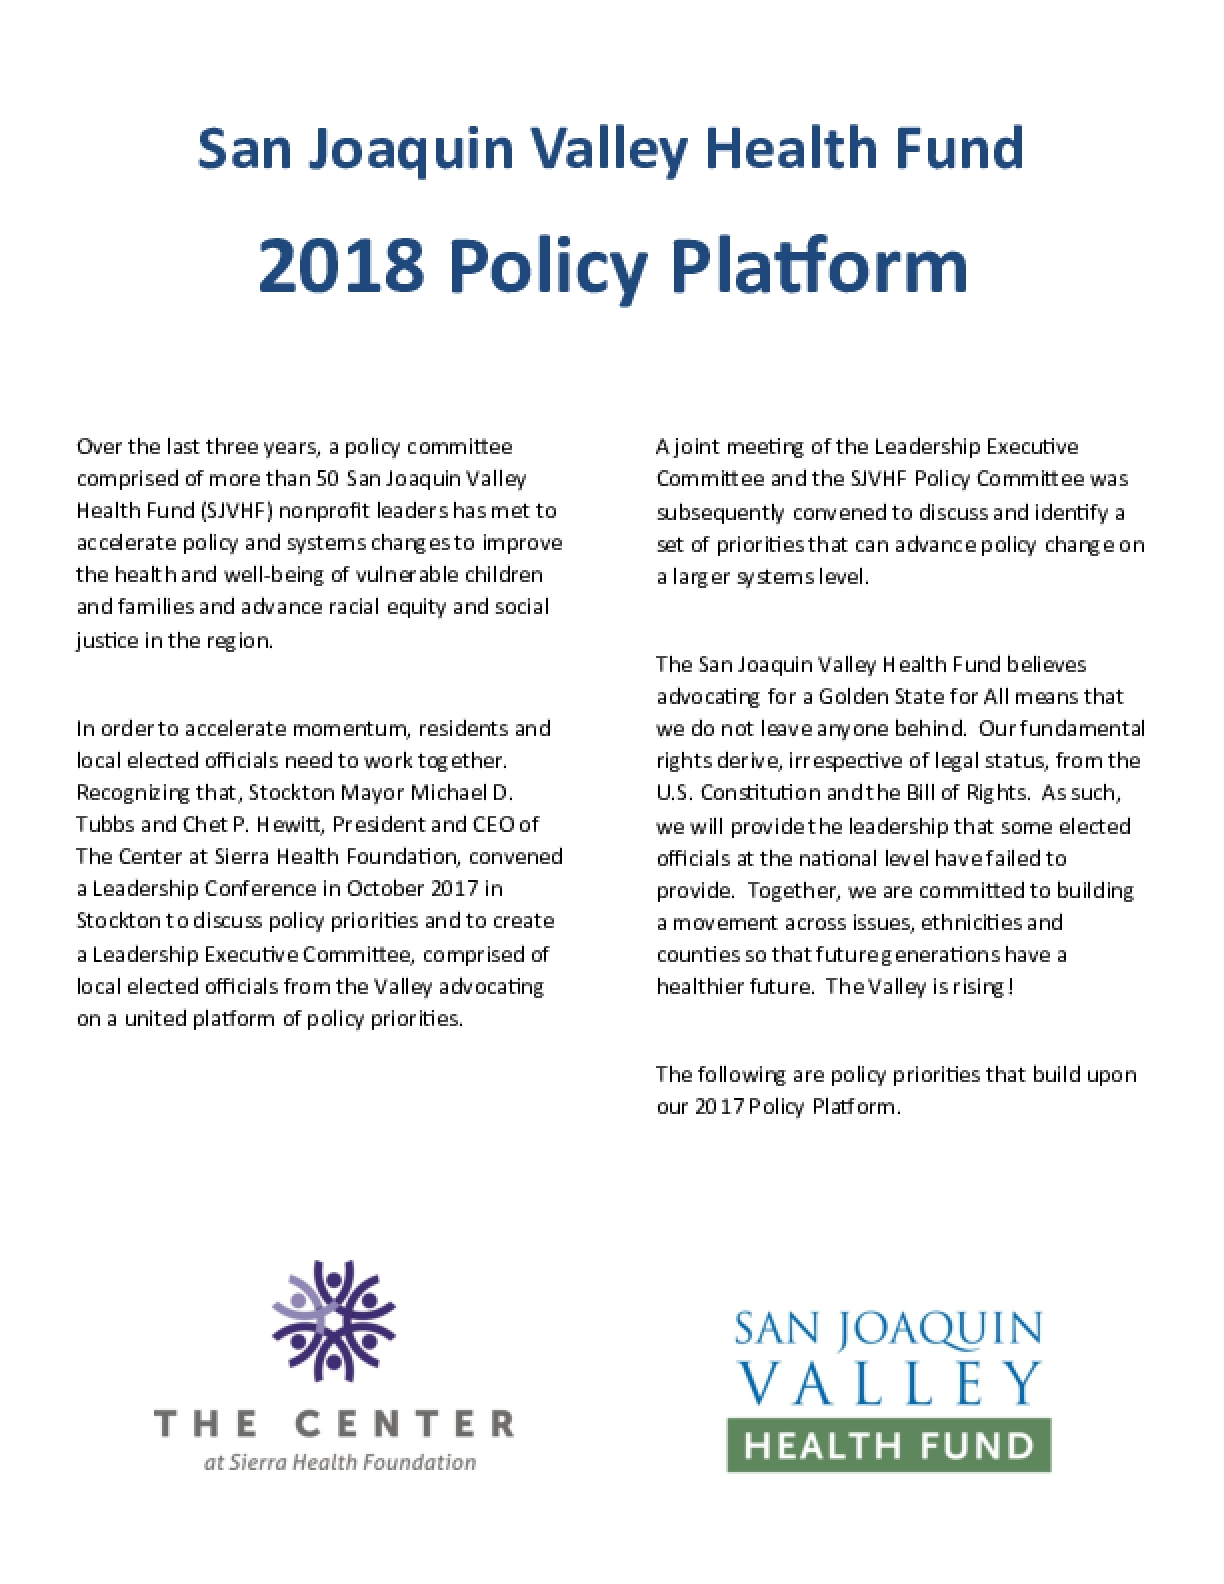 San Joaquin Valley Health Fund: 2018 Policy Platform